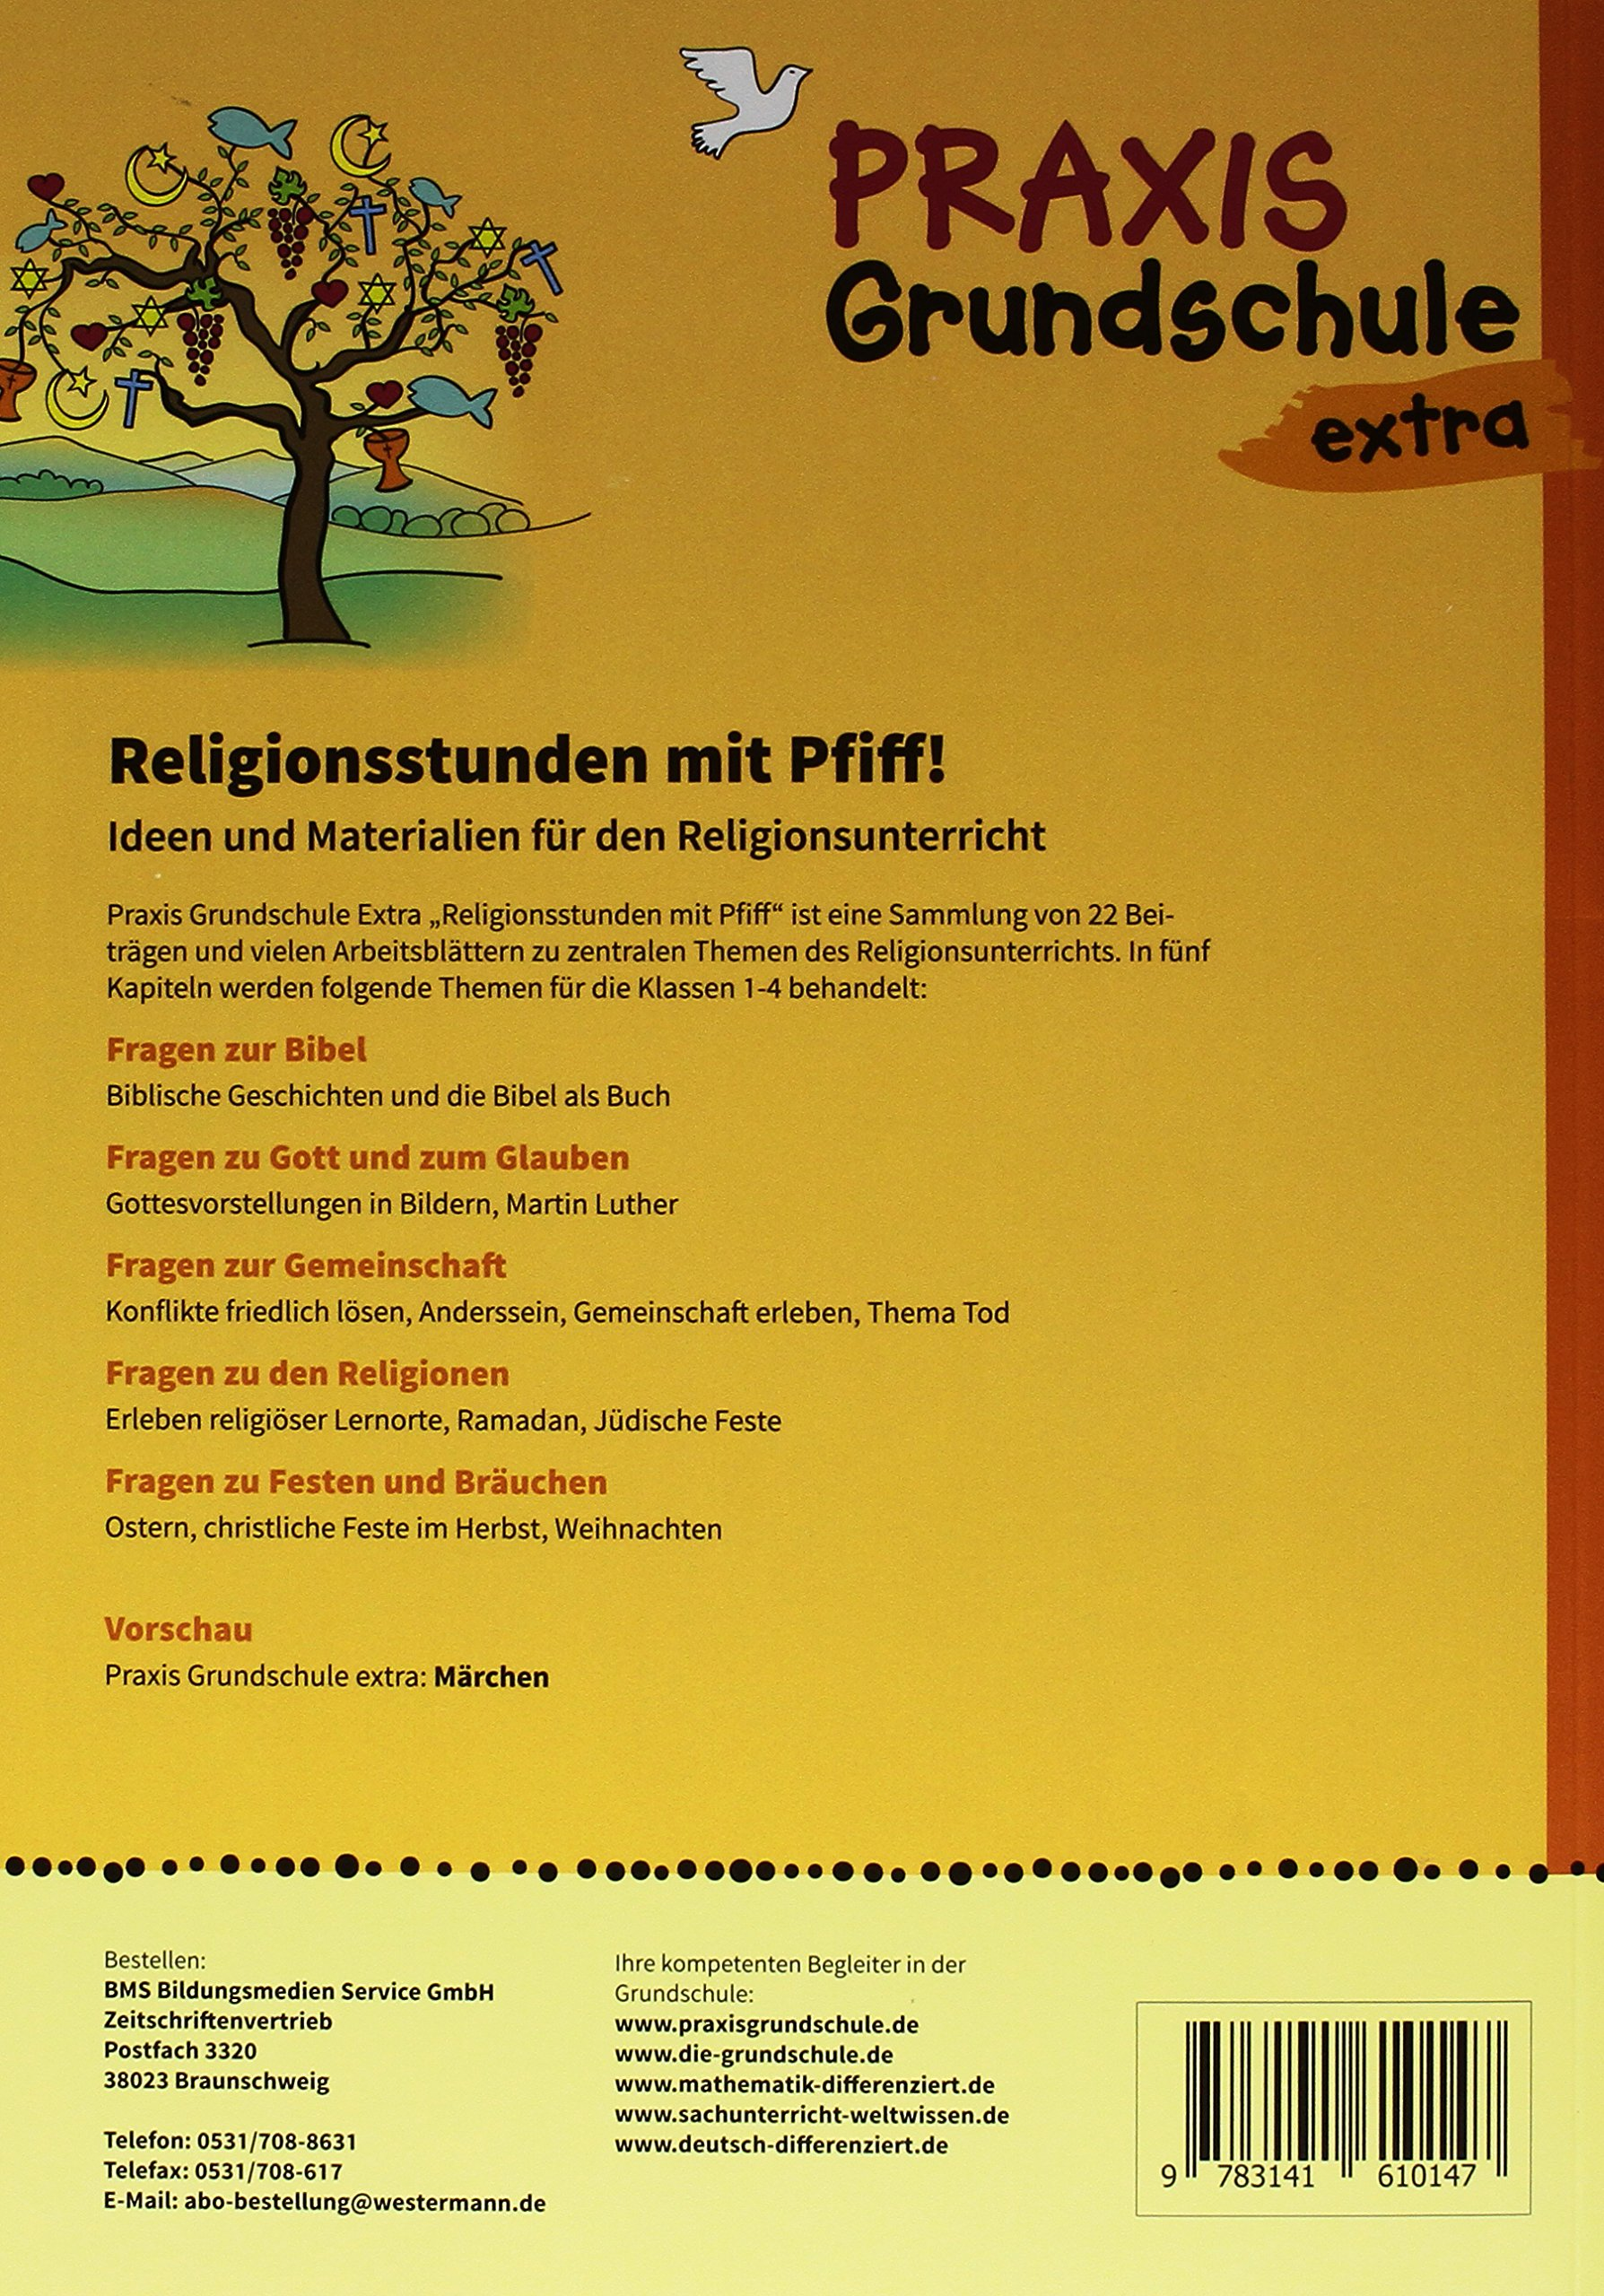 Atemberaubend Mathe Praxis 6Klasse Arbeitsblatt Bilder - Super ...